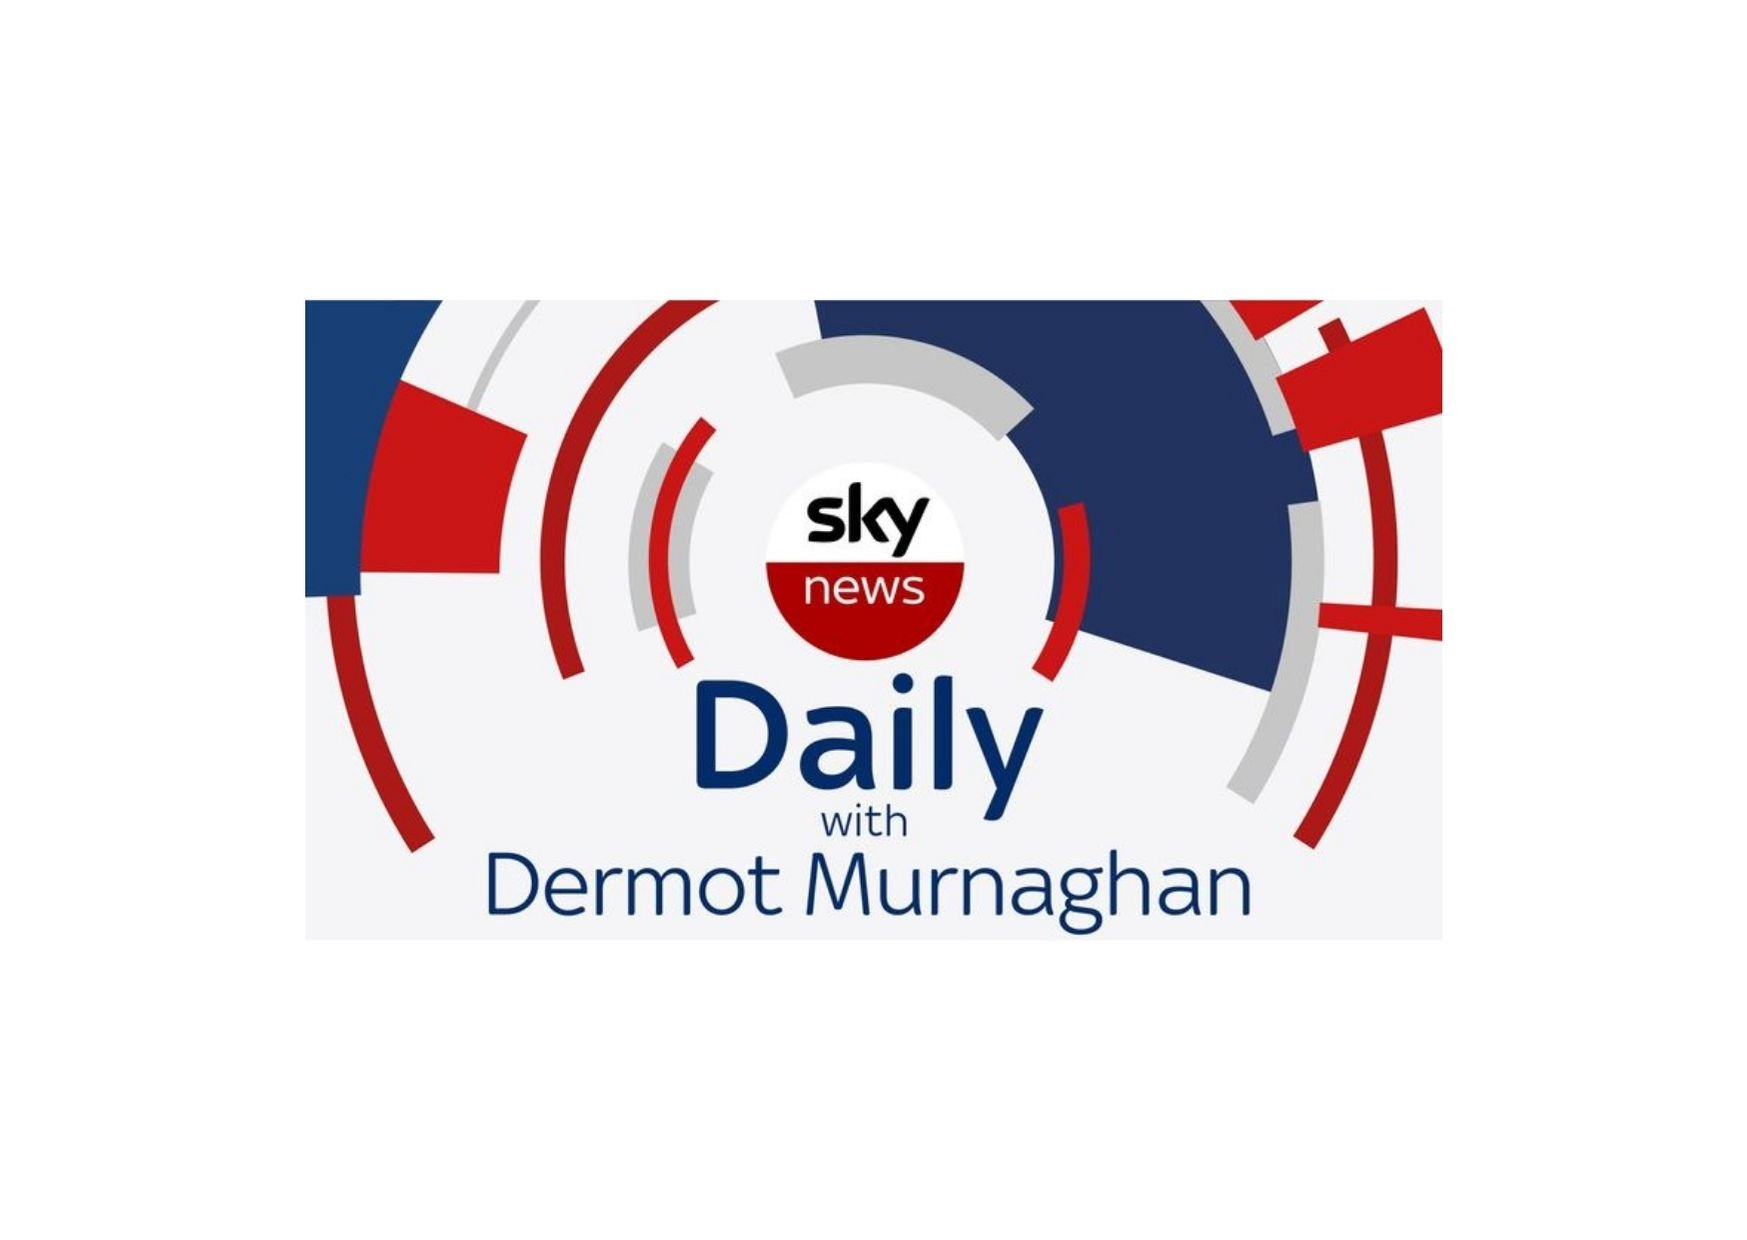 Noreena on Sky News Daily, Podcast